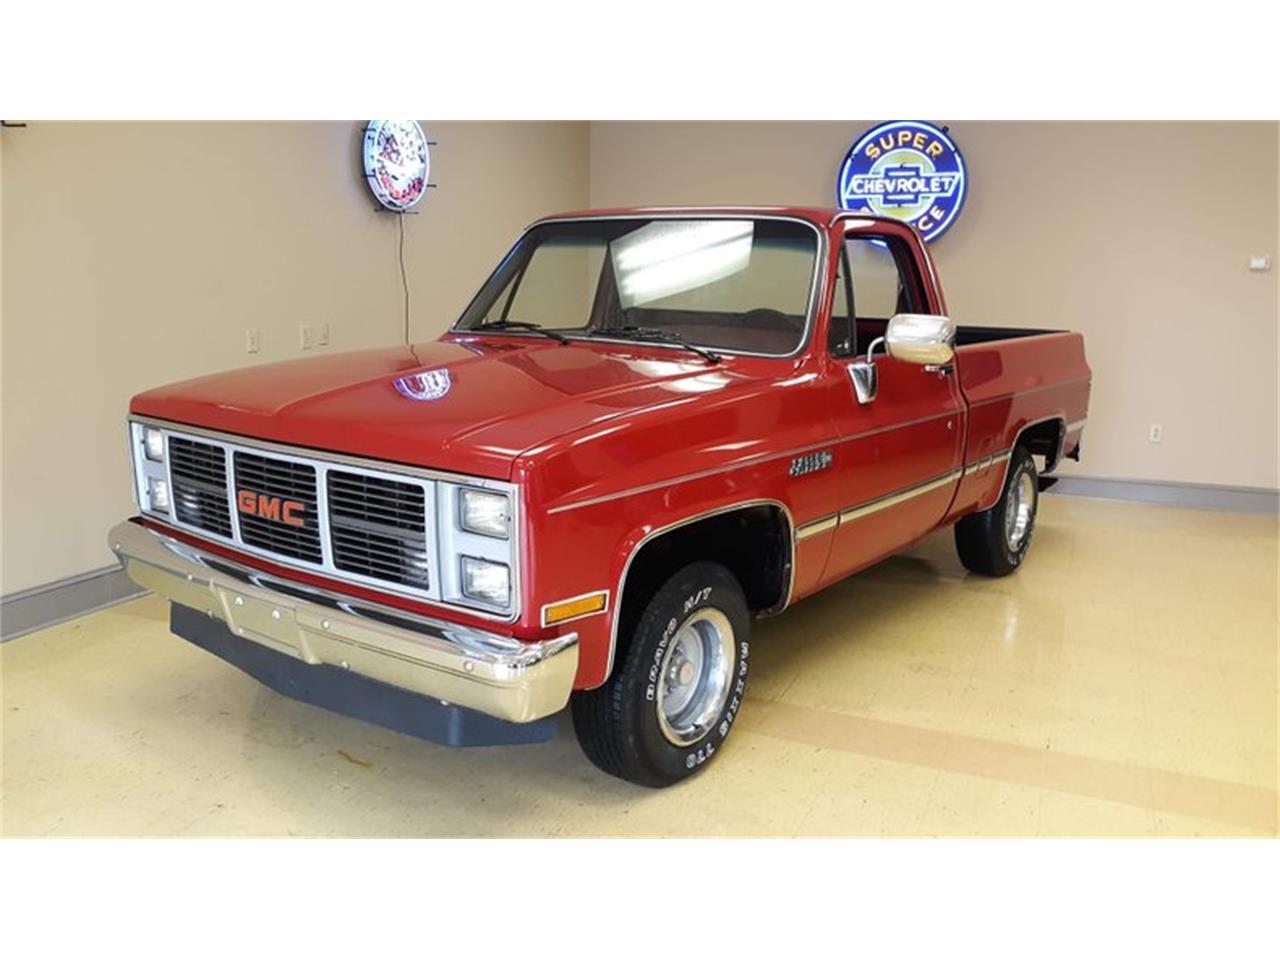 for sale at auction 1987 gmc sierra in greensboro, north carolina cars - greensboro, nc at geebo